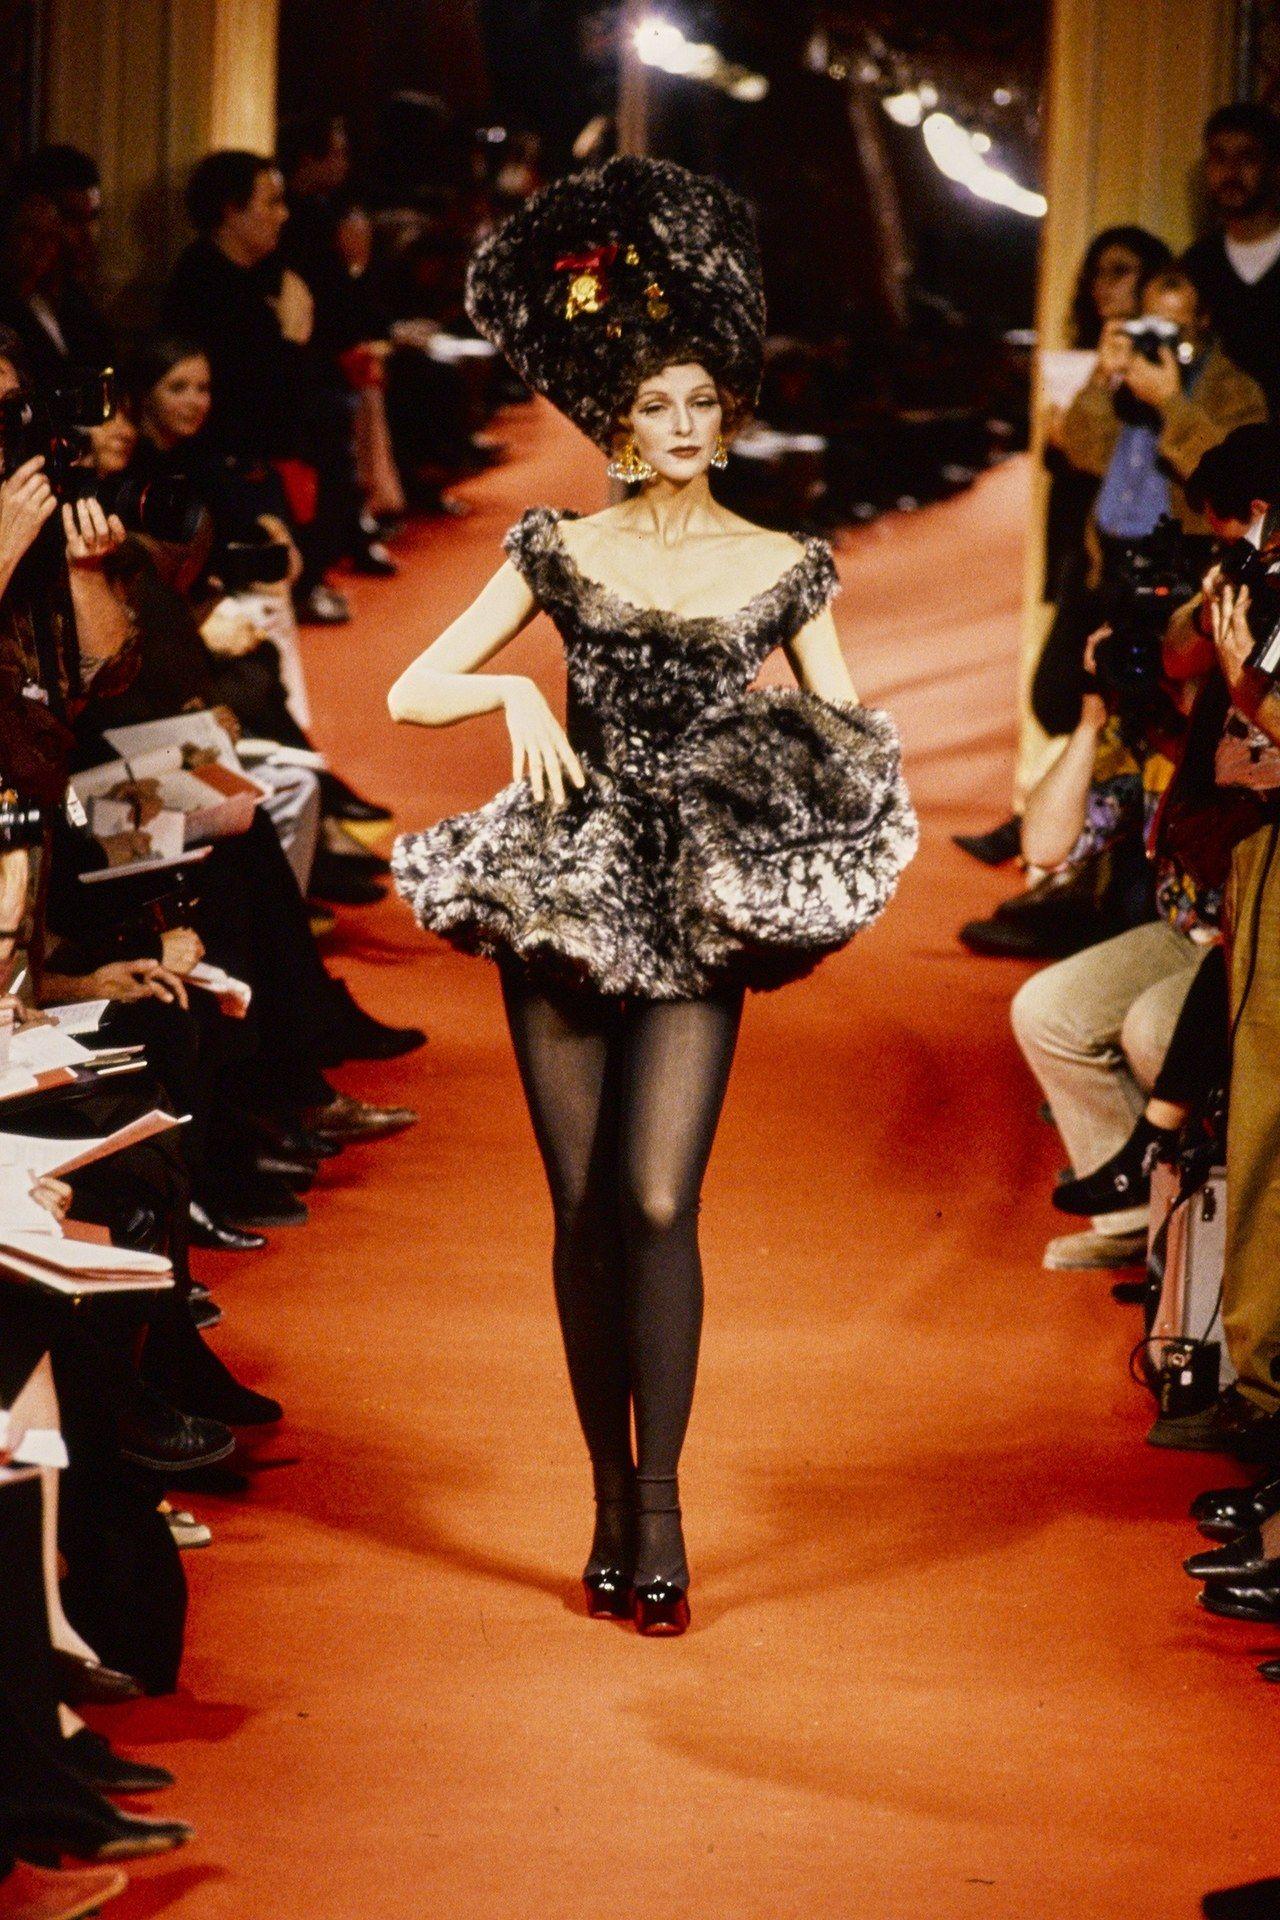 Simonetta Gianfelici at Vivienne Westwood F/W 1995 - #90s #Gianfelici #runway #Simonetta #Vivienne #Westwood